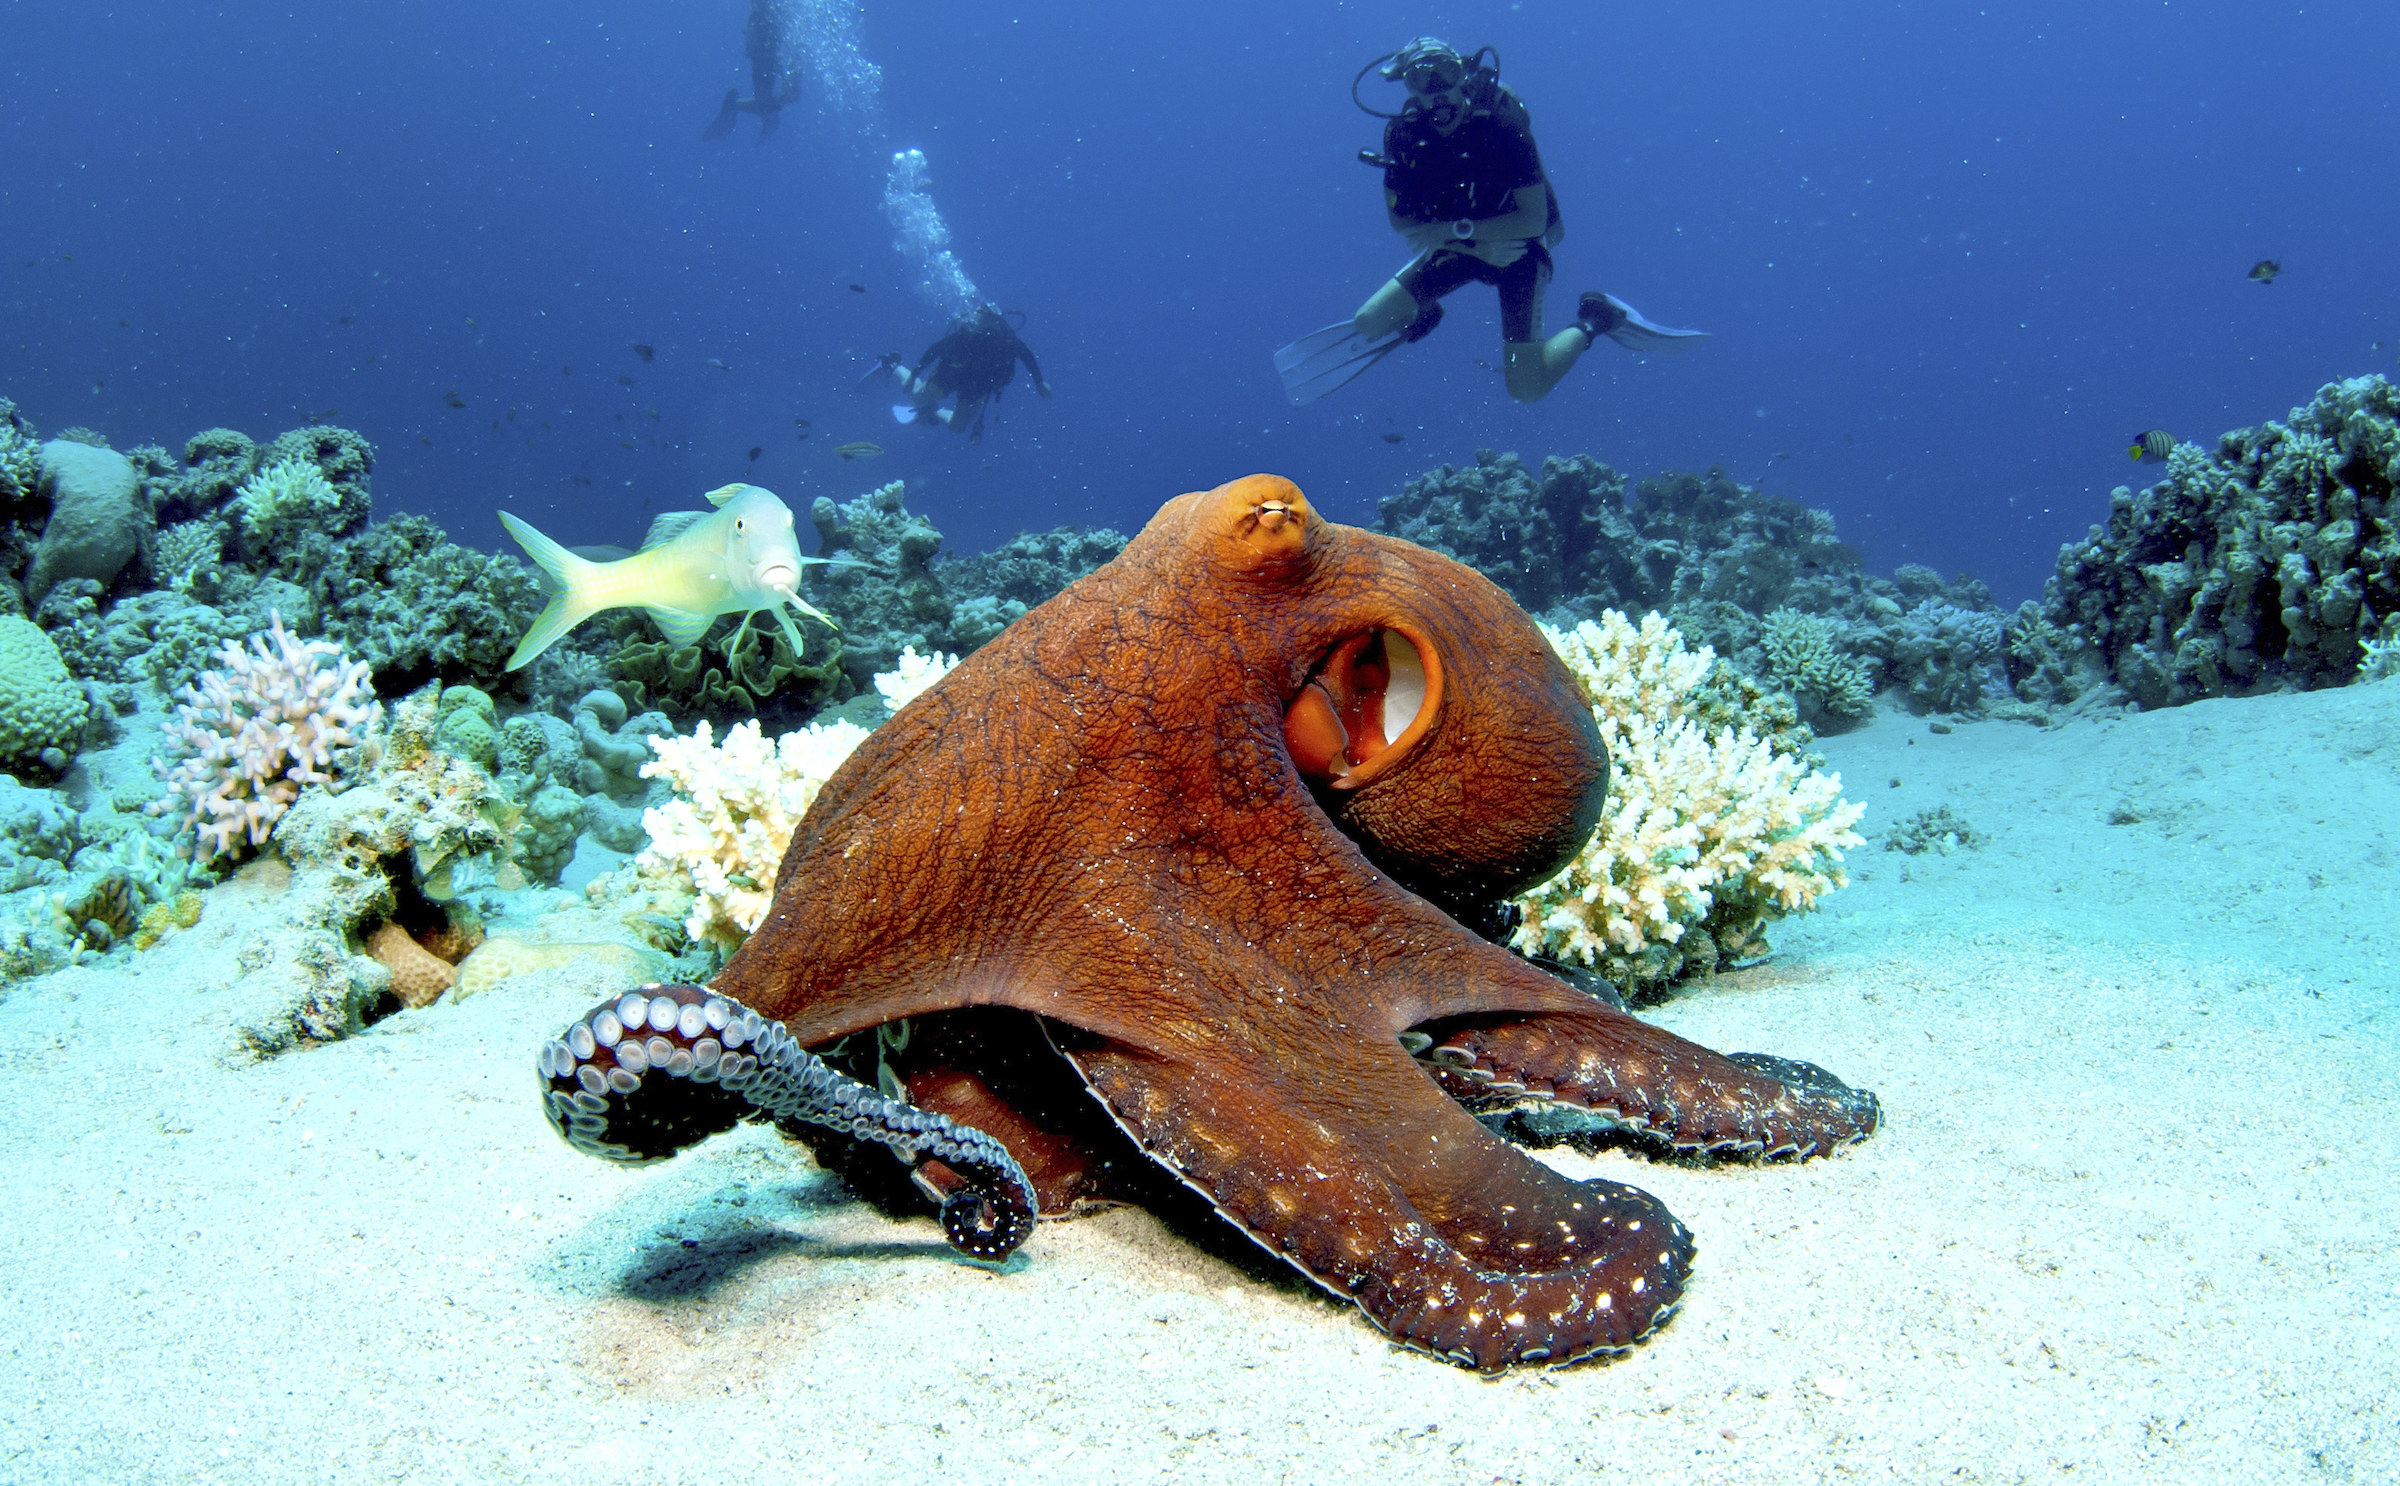 An octopus on the sea floor.